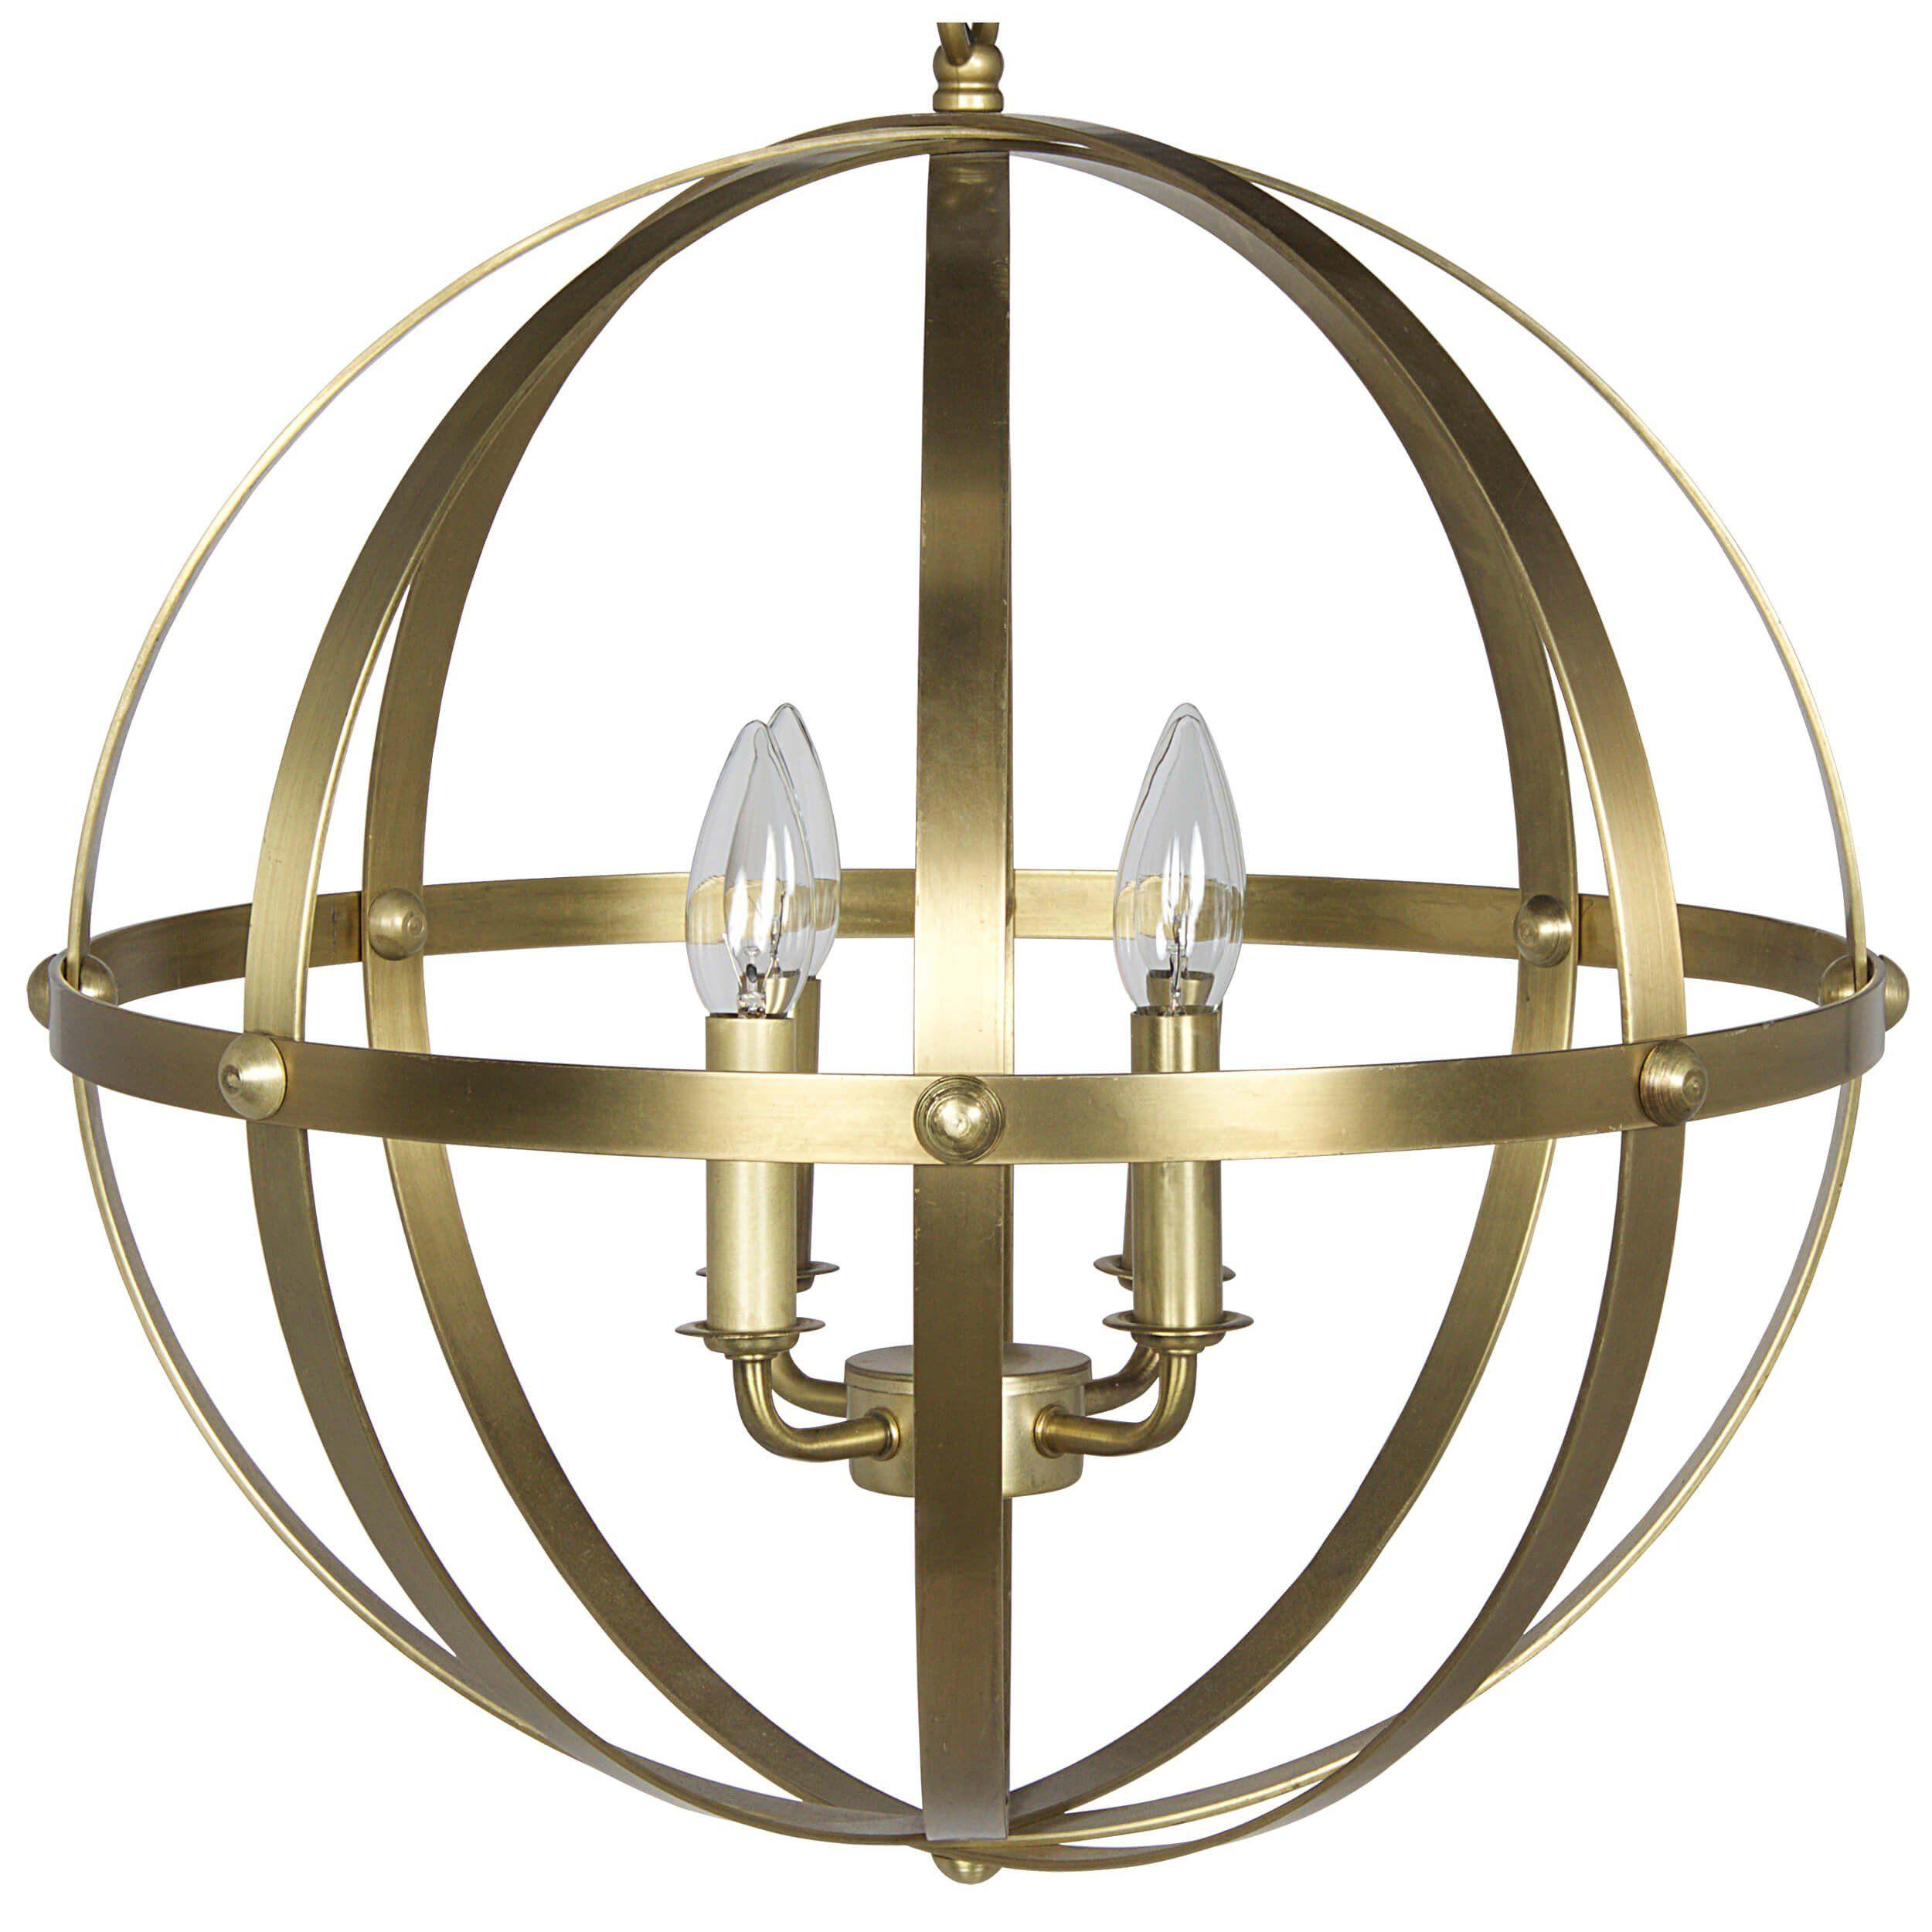 353 pendant small antique brass chandeliers lighting 353 pendant small antique brass chandeliers lighting arubaitofo Choice Image